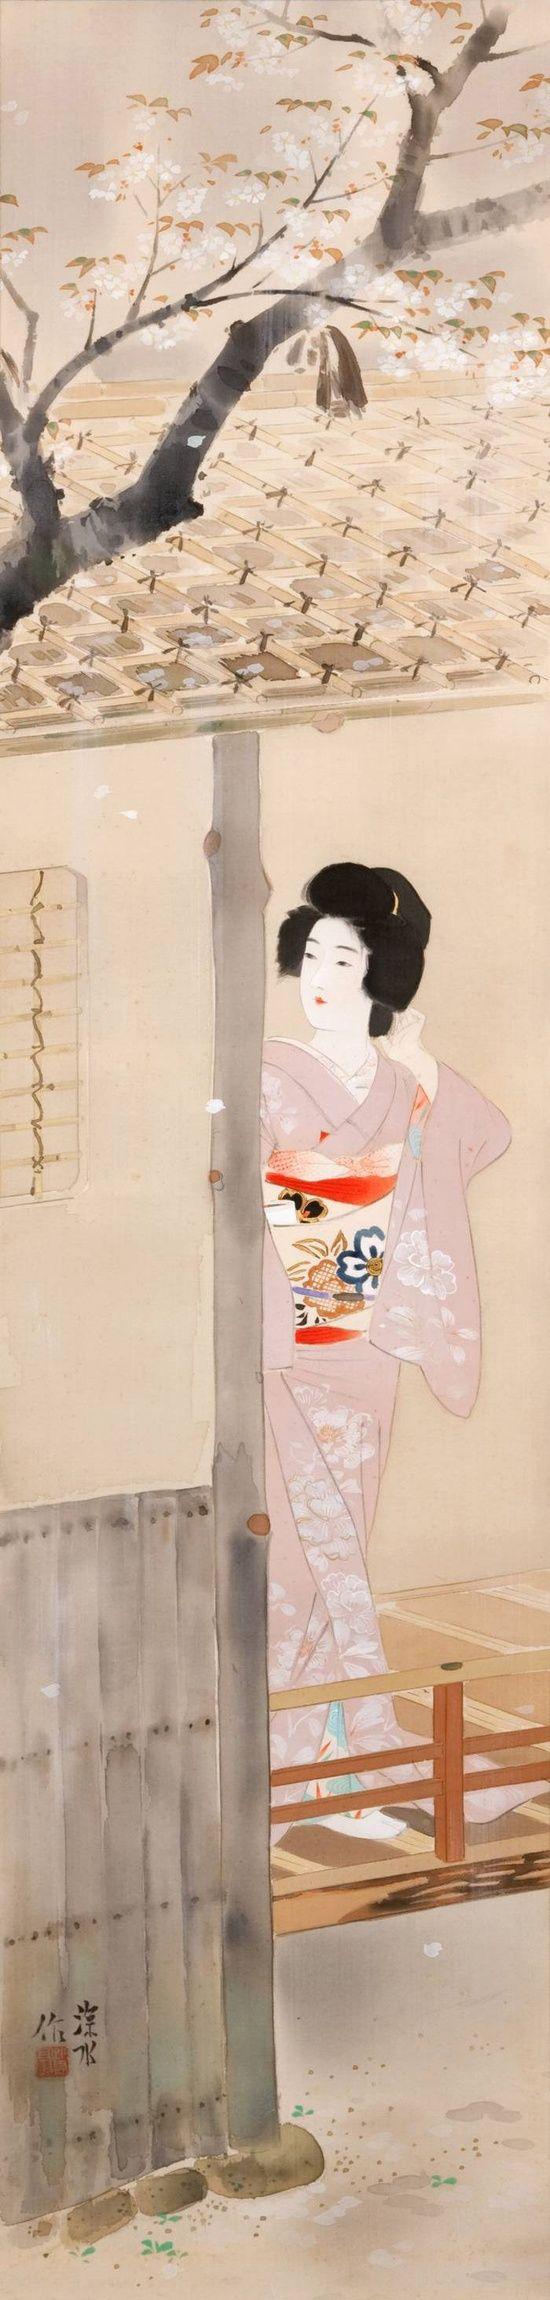 UKIYO - E.....BY ITO SHINSUI.....1898..1972......ON KIMONO AND COSTUME ART......